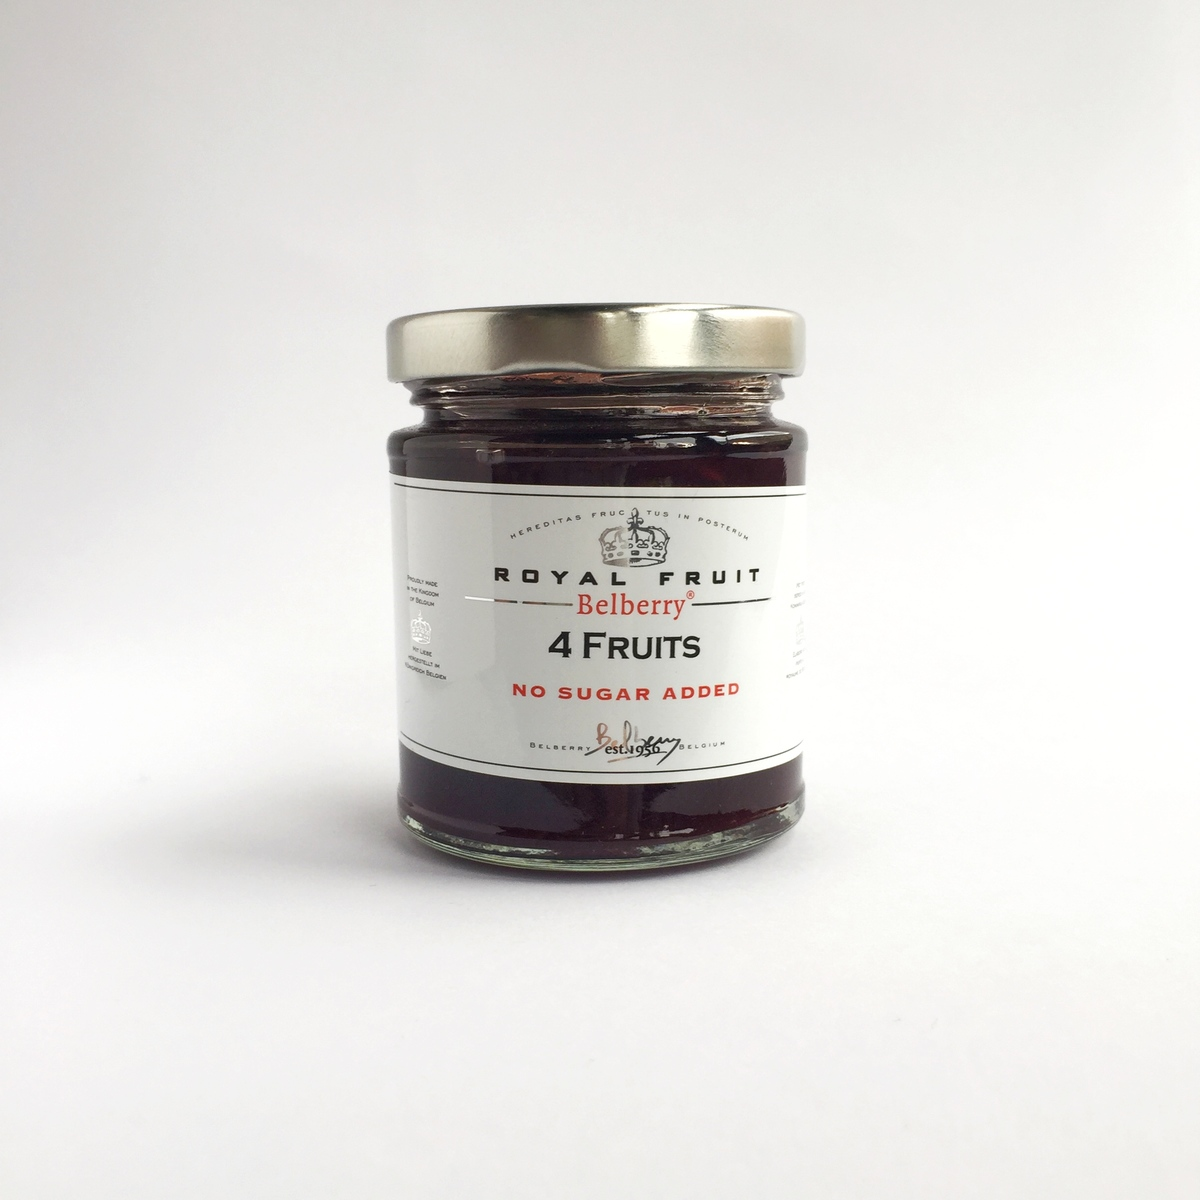 Mermelada Royal Fruit Belberry - 4 Fruits